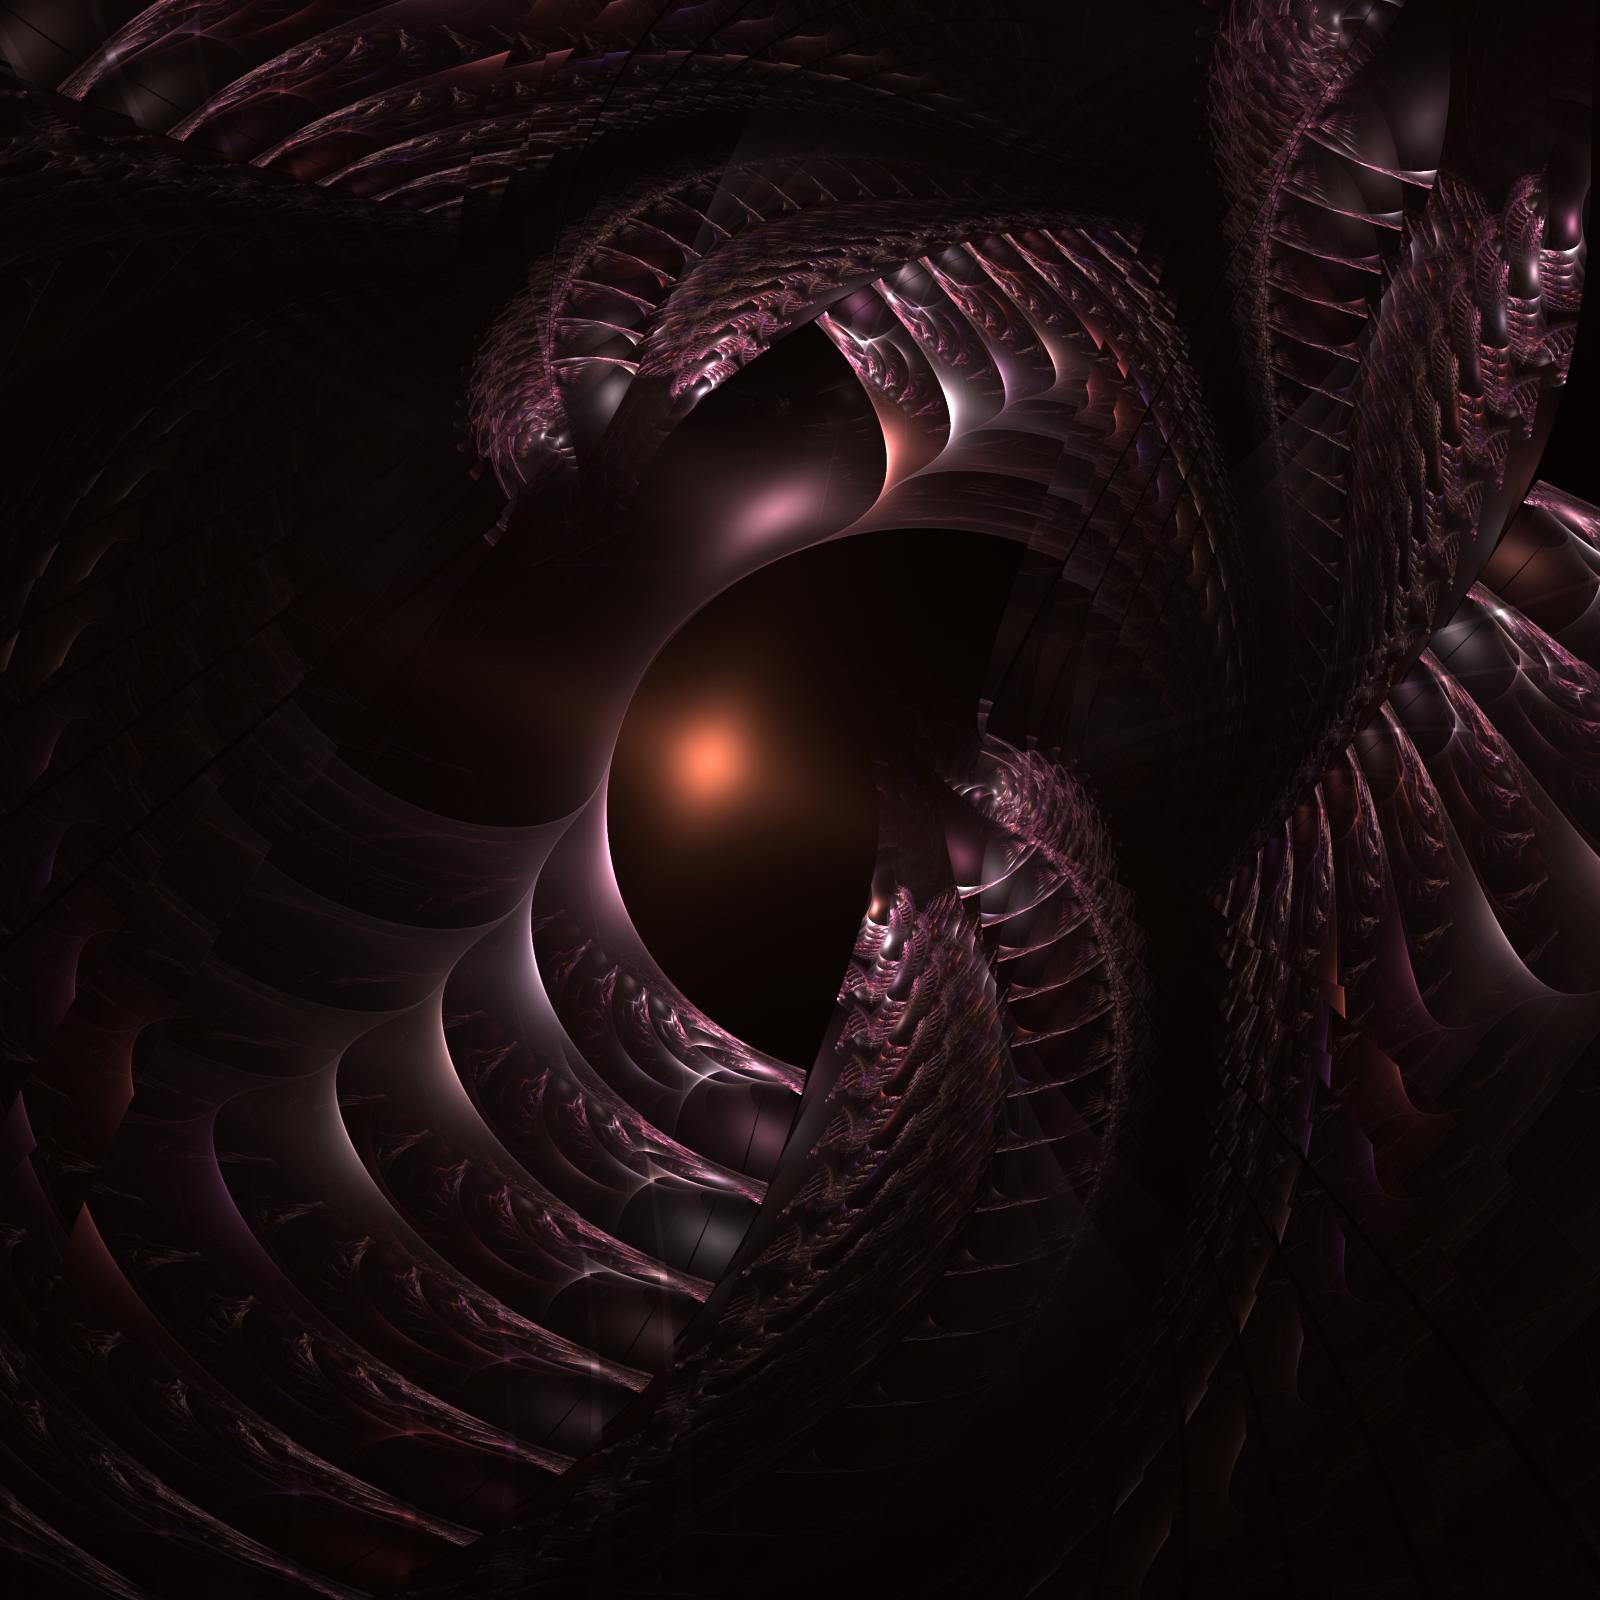 Biomechanical by EternalNight11 on DeviantArt